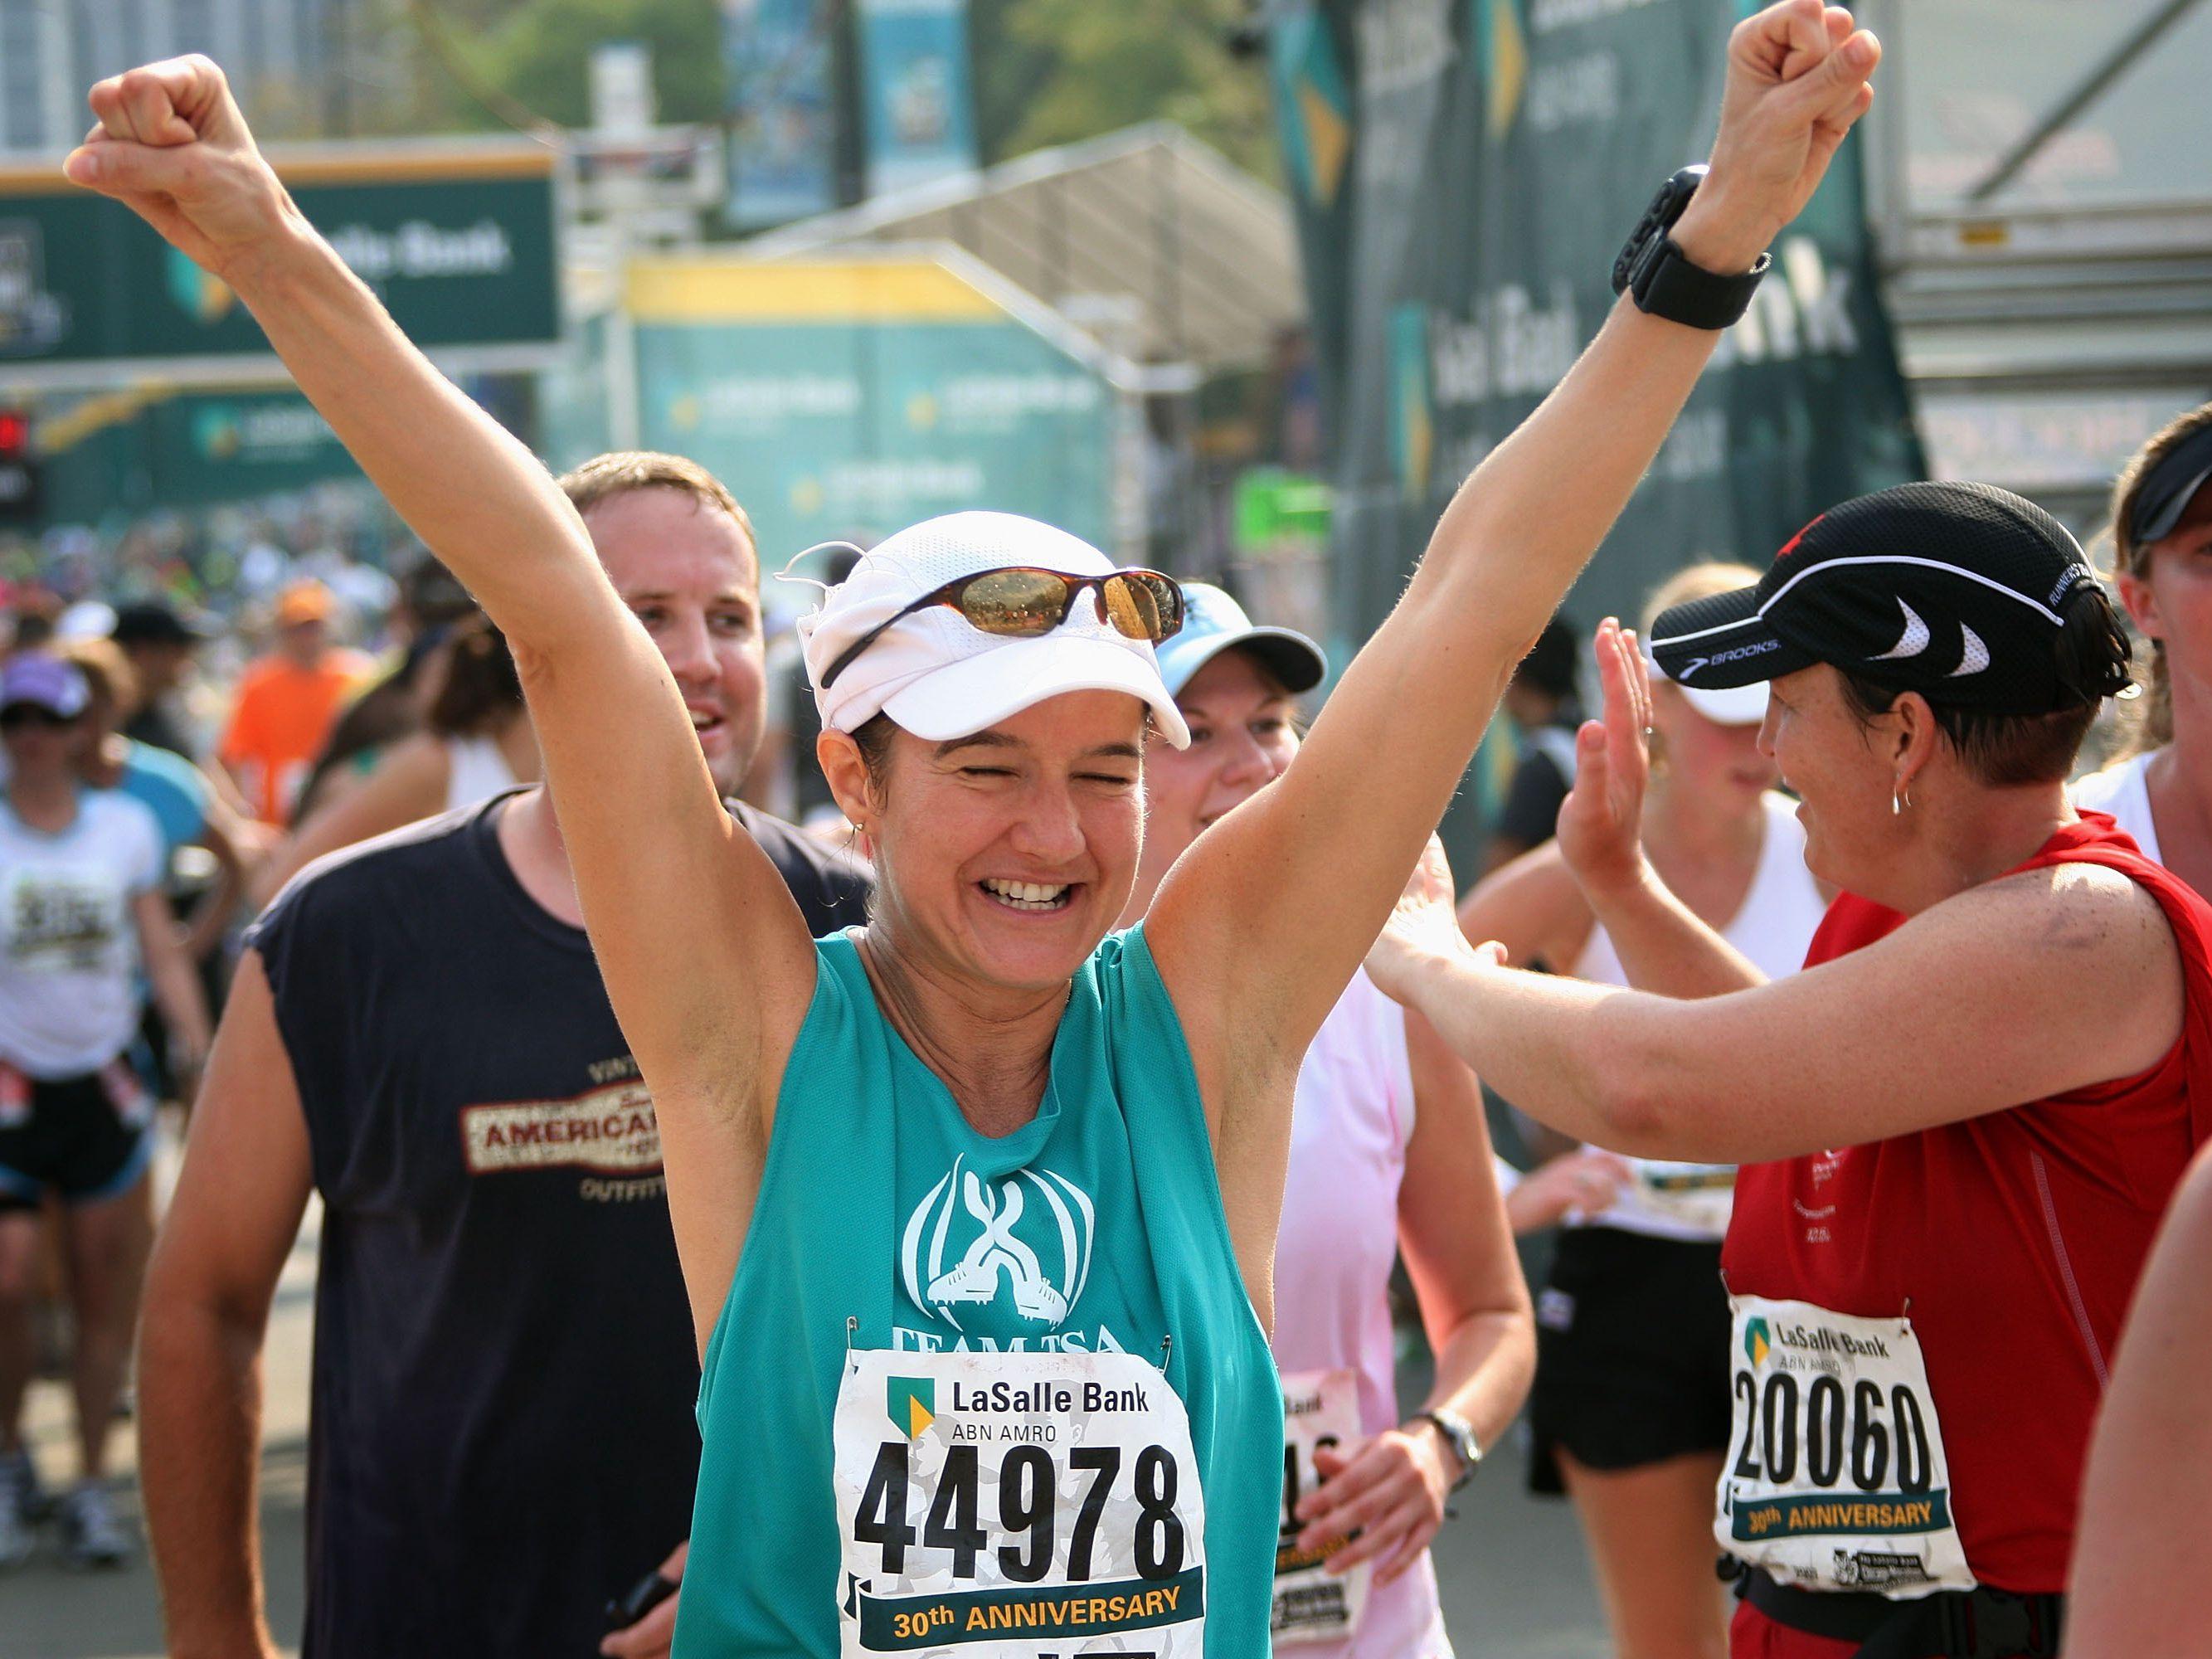 How to Get Into the Chicago Marathon